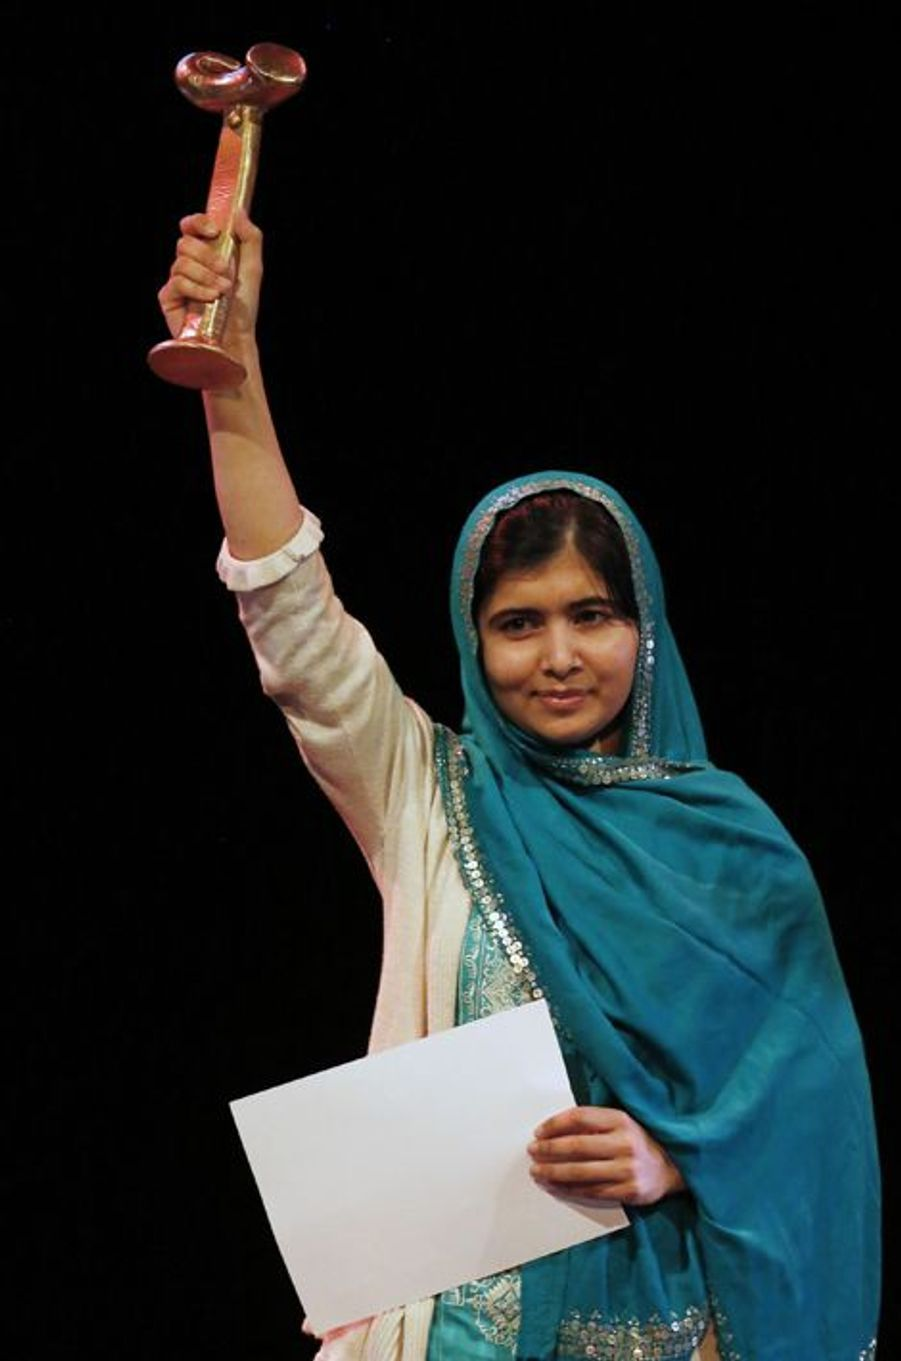 Malala reçoit le prix RAW (Reach All Women) in War Anna Politkovskaya, le 4 octobre 2013